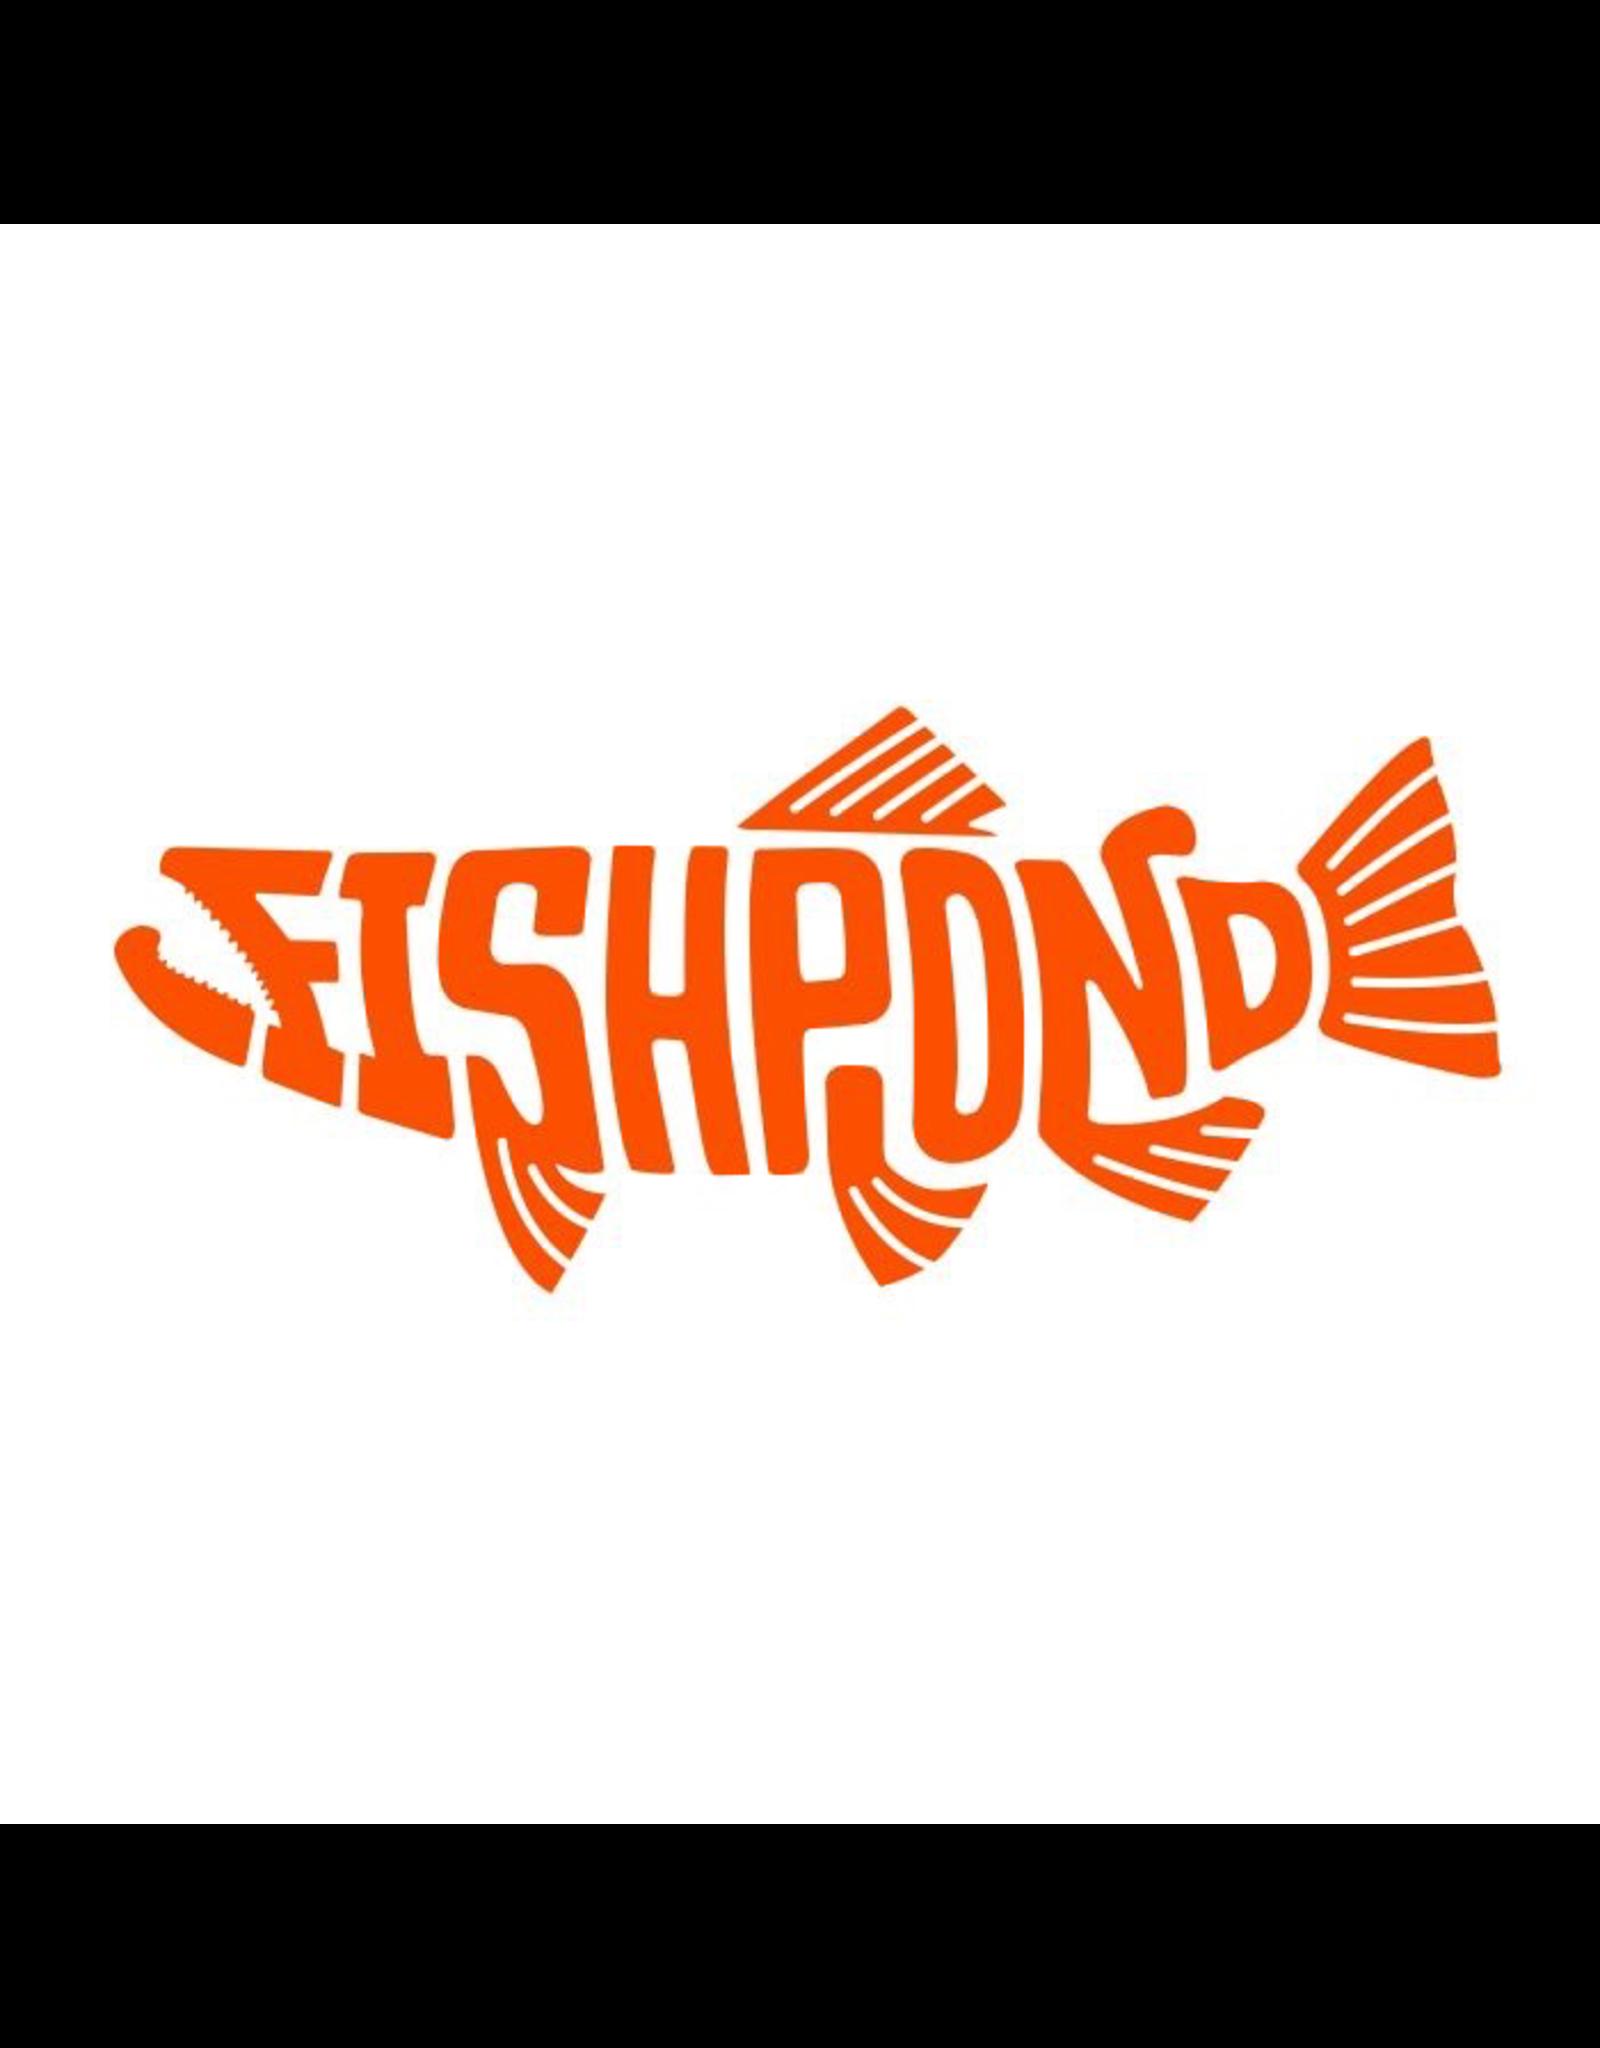 Fishpond Fishpond Pescado Sticker